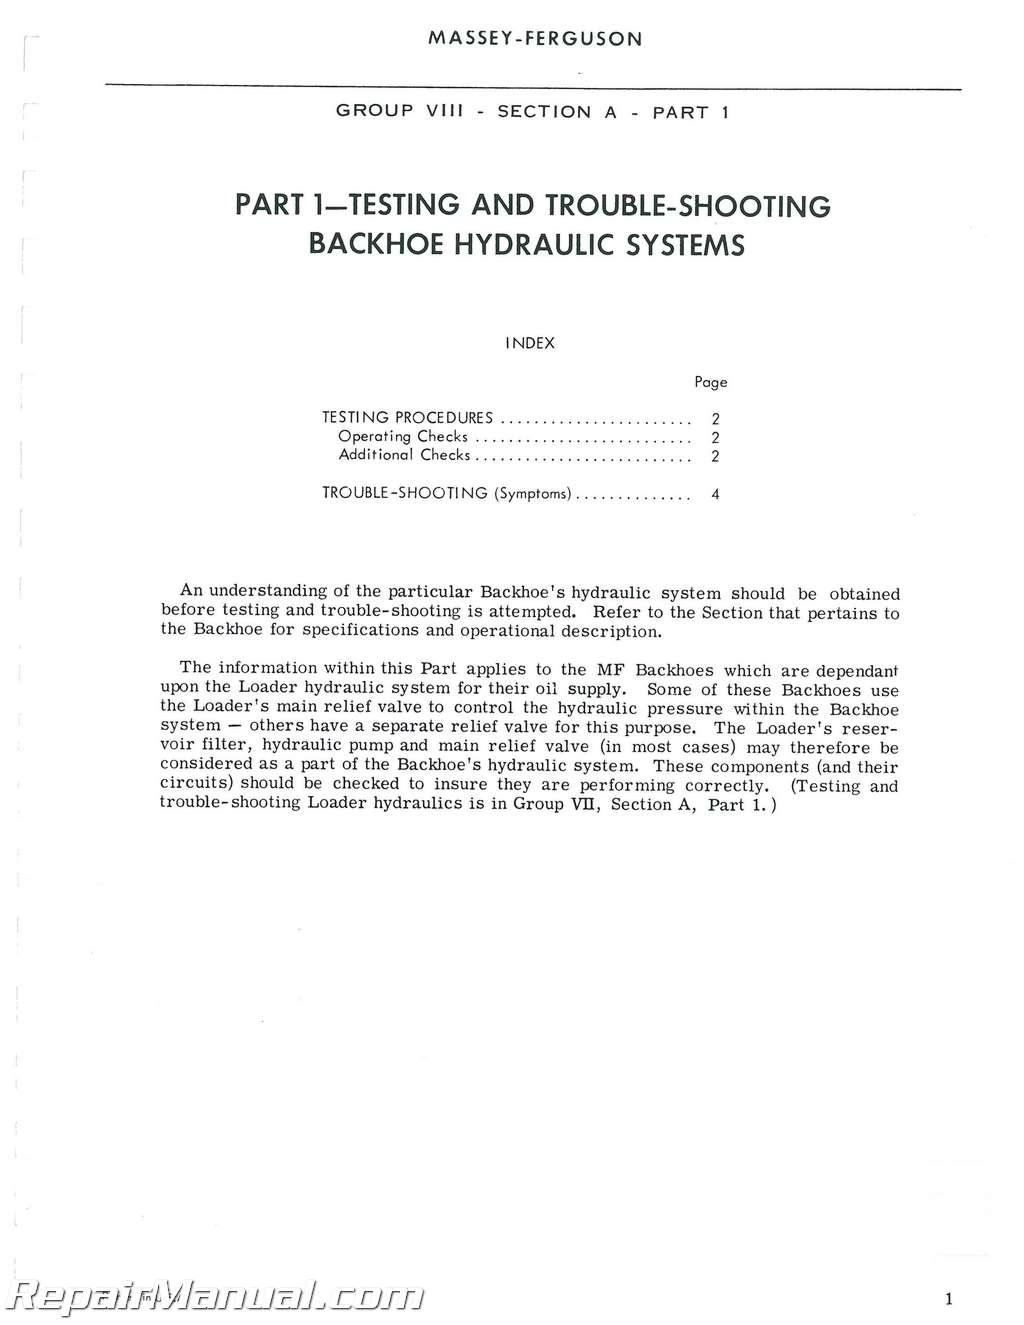 Massey Ferguson MF185 MF210 MF220 MF222 MF232 MF325 Backhoe Attachment Service  Manual